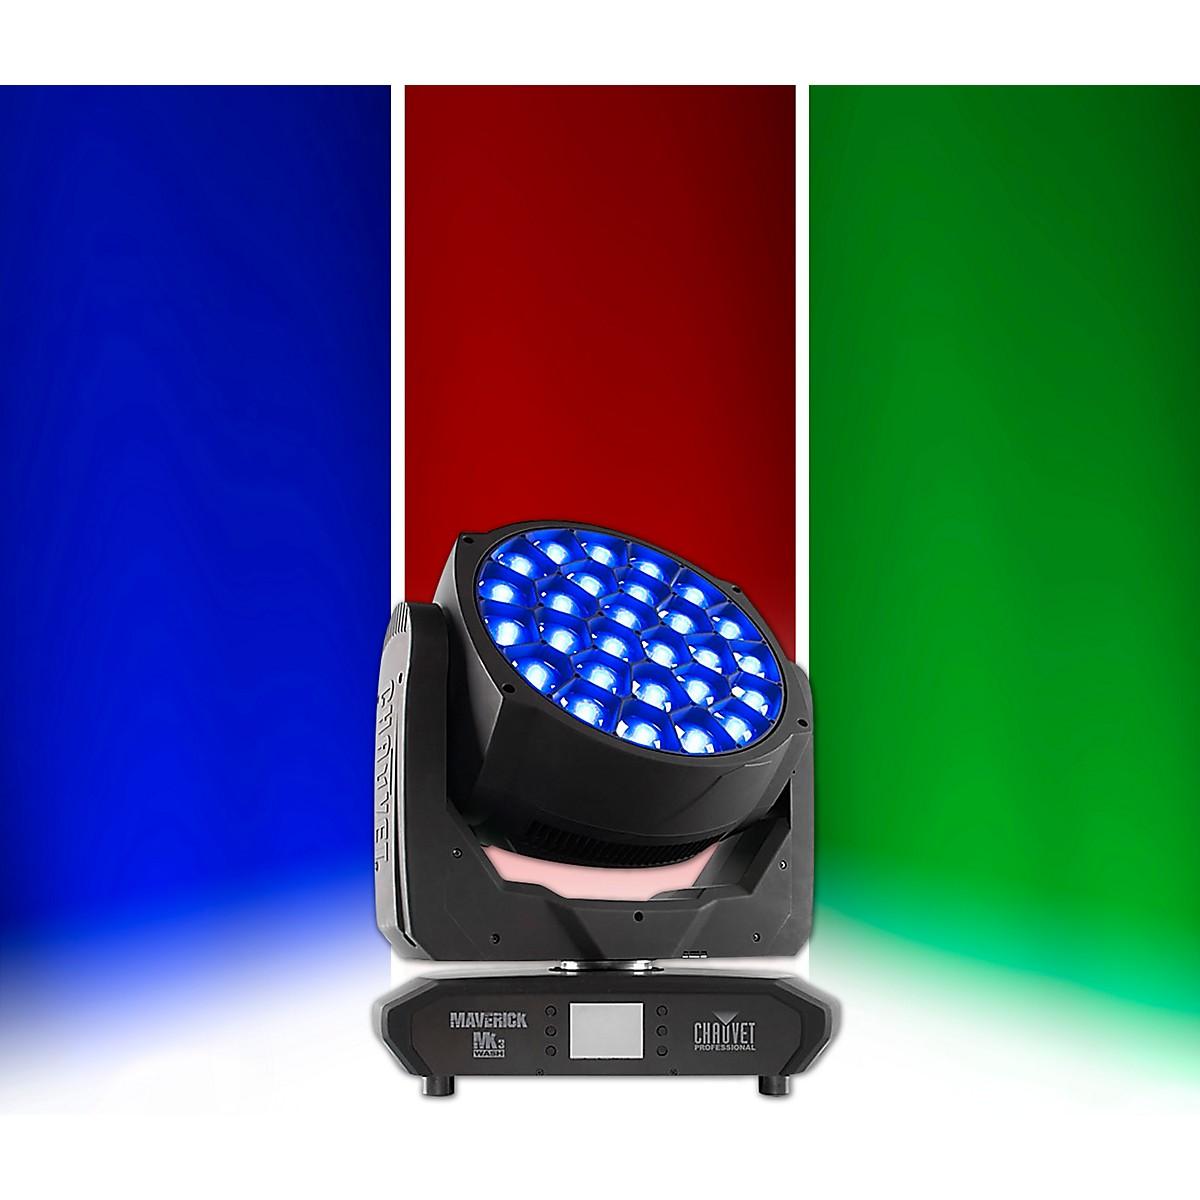 CHAUVET Professional Maverick MK3 Wash RGBW LED Moving-Head Fixture